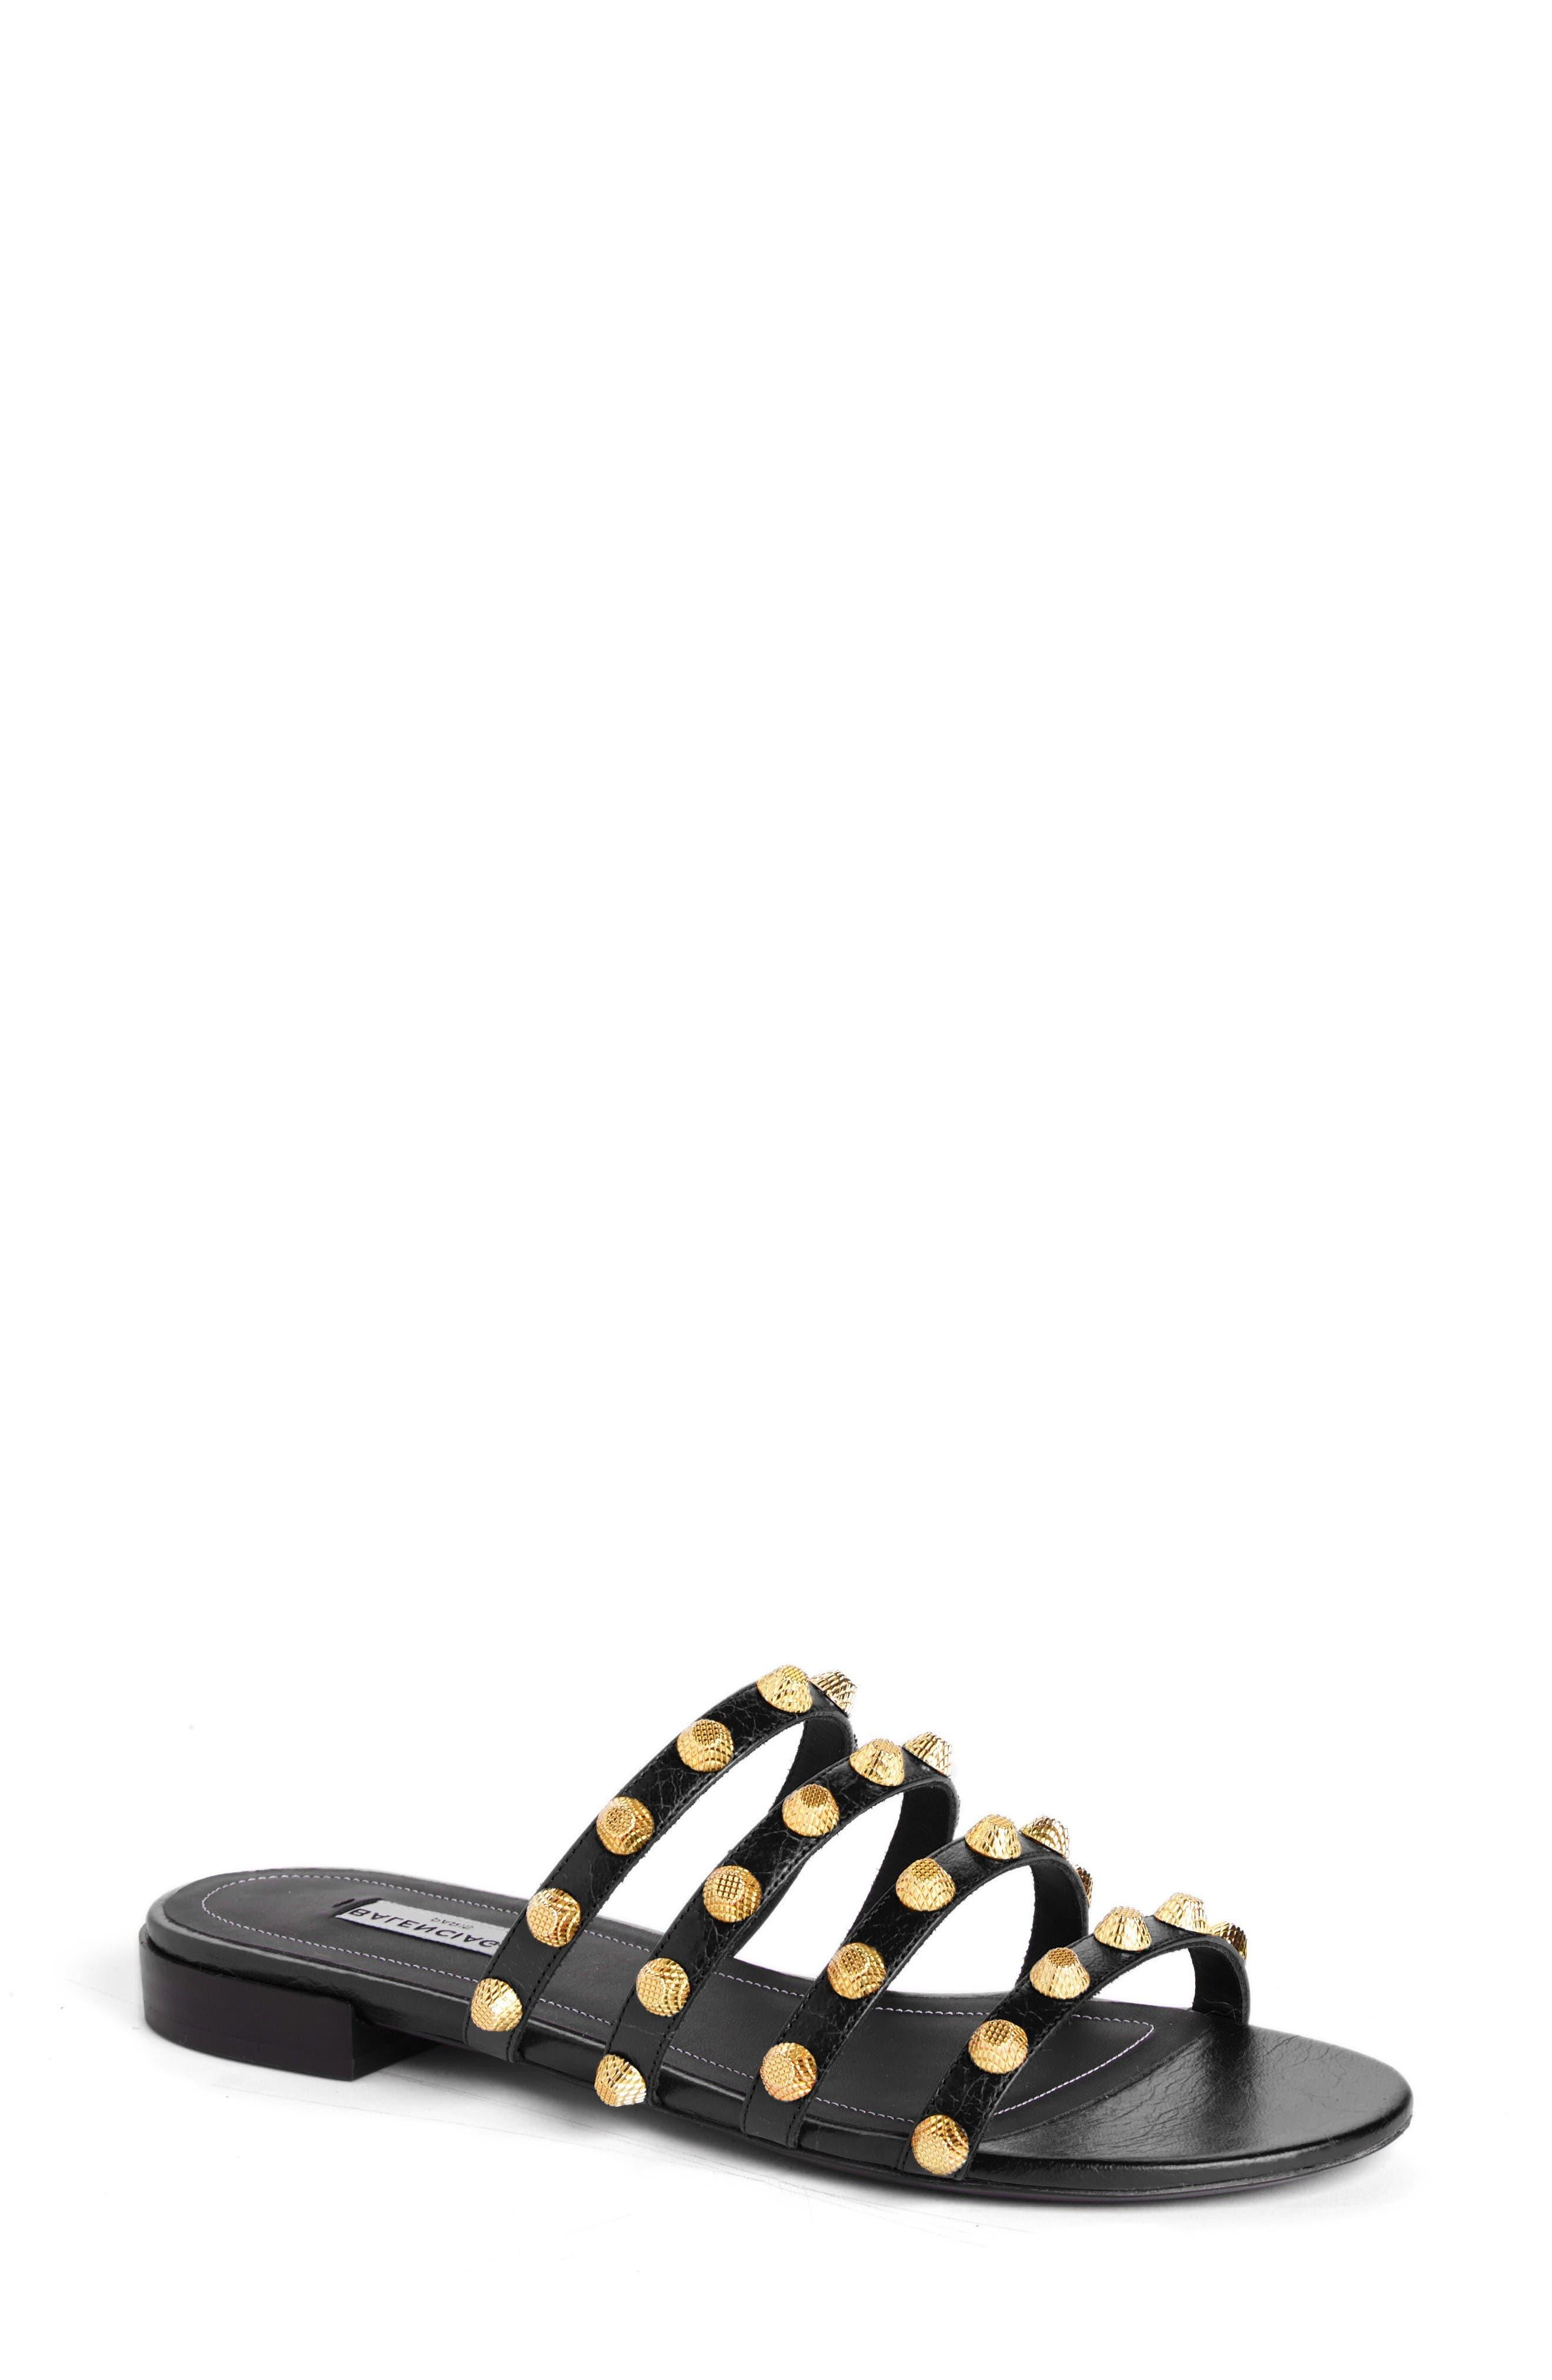 Main Image - Balenciaga Studded Slide Sandal (Women)